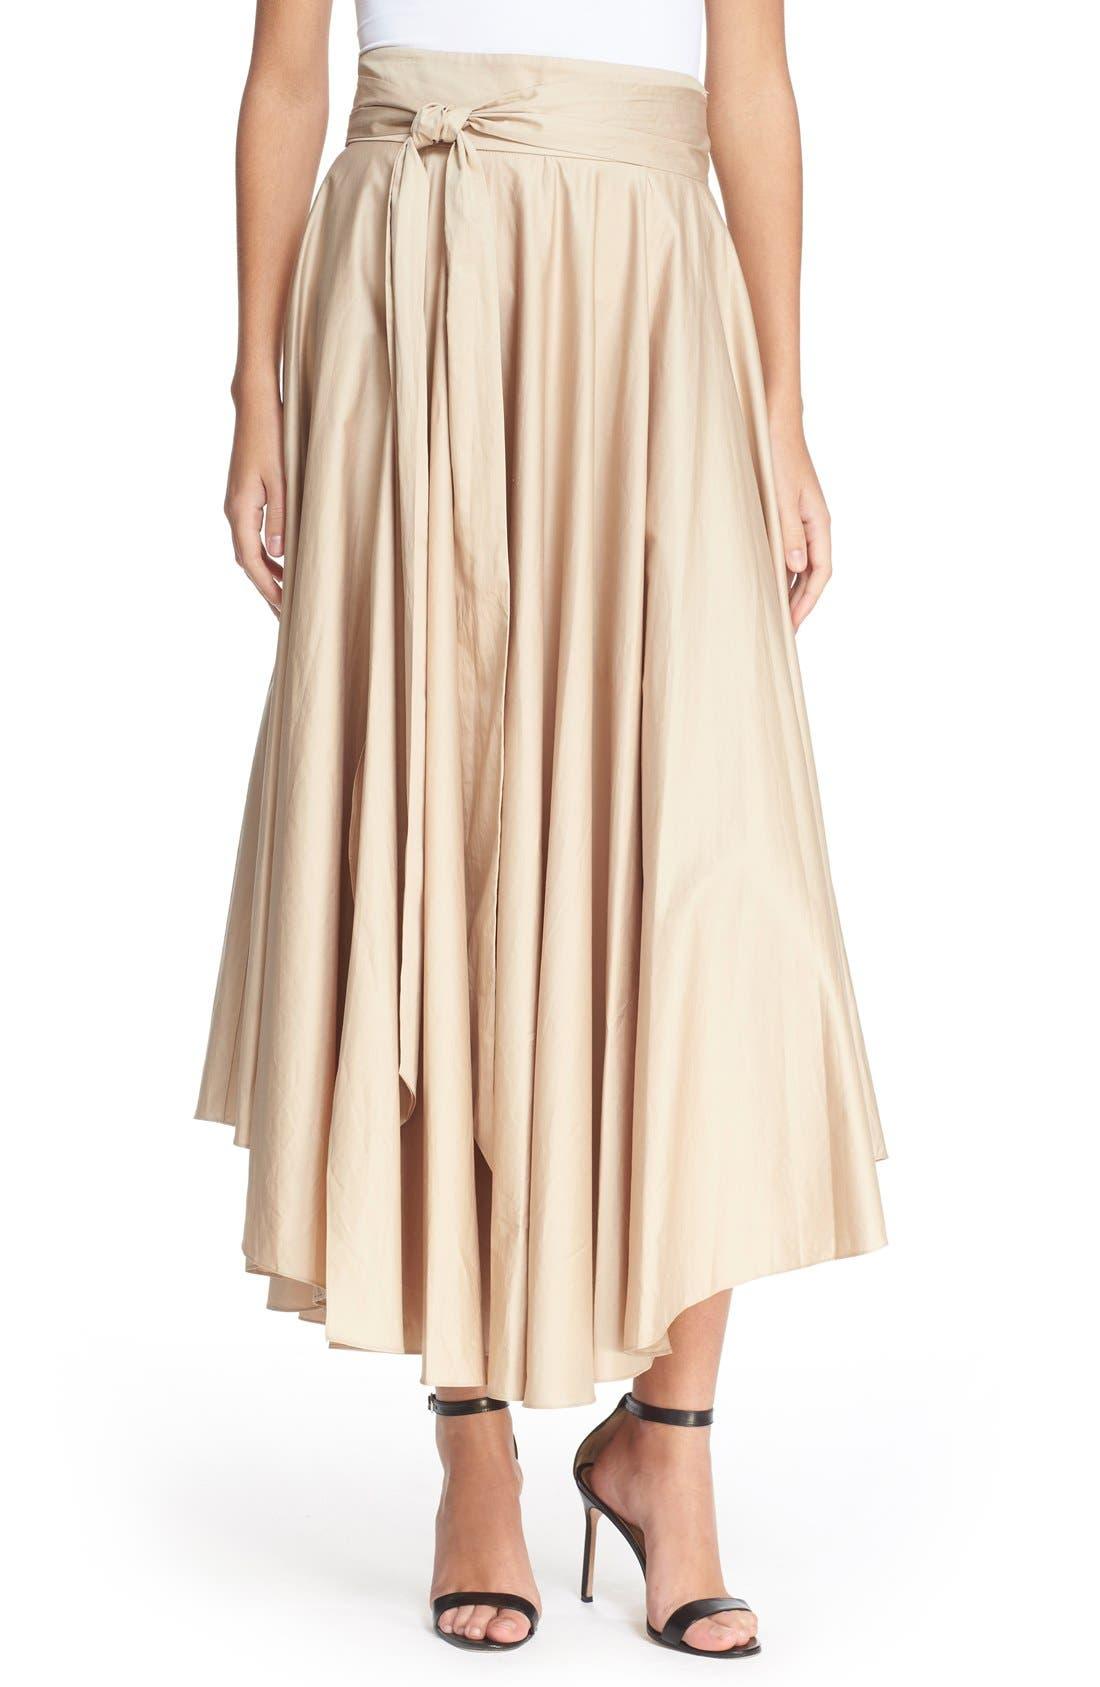 Alternate Image 1 Selected - Tibi Belted Cotton Maxi Skirt